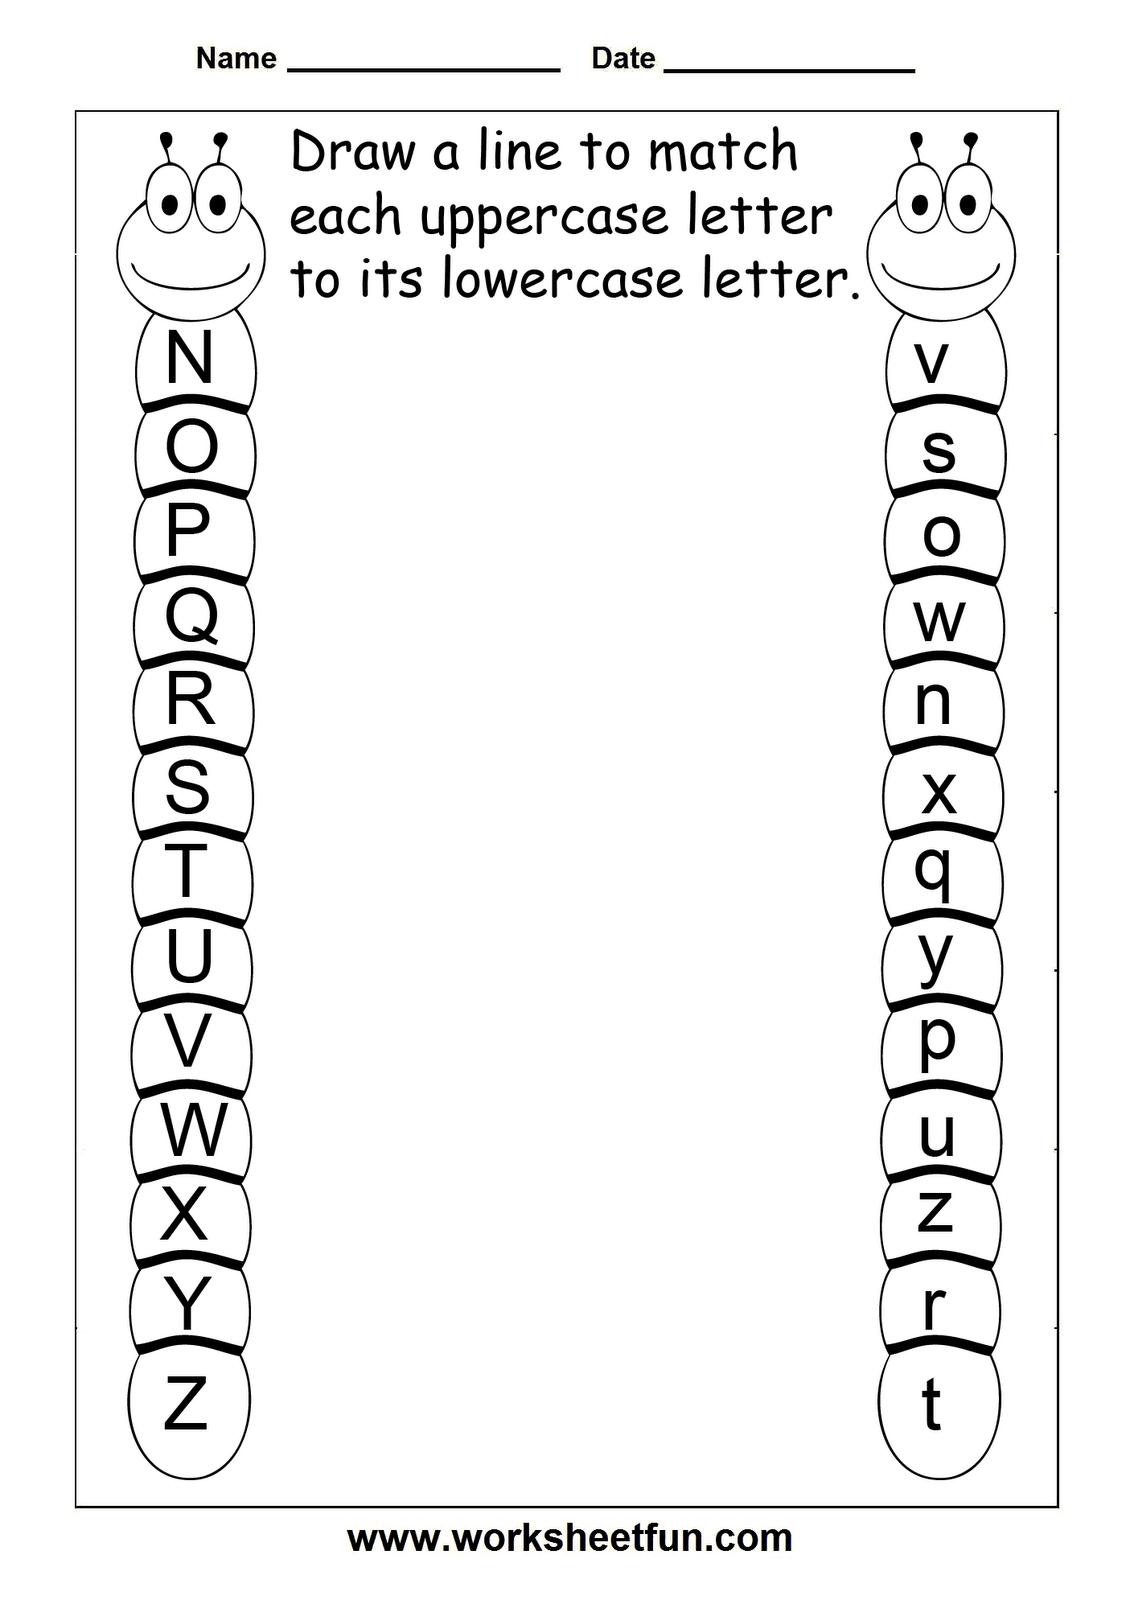 Worksheetfun - FREE PRINTABLE WORKSHEETS | 1st Grade | Pinterest ...